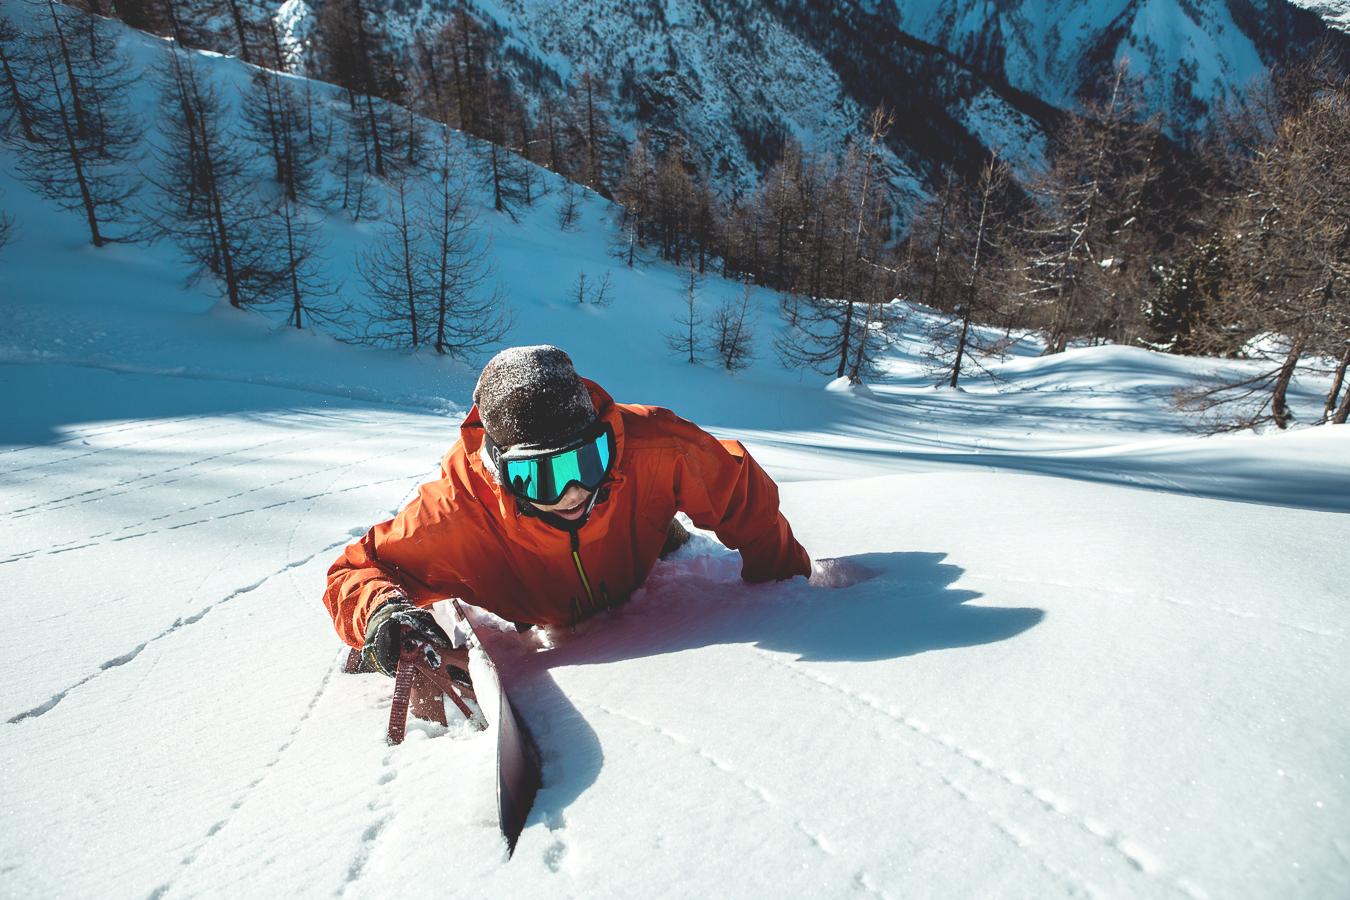 leviluggen_deep_pow_snowboard_silvanozeiter_2.jpg